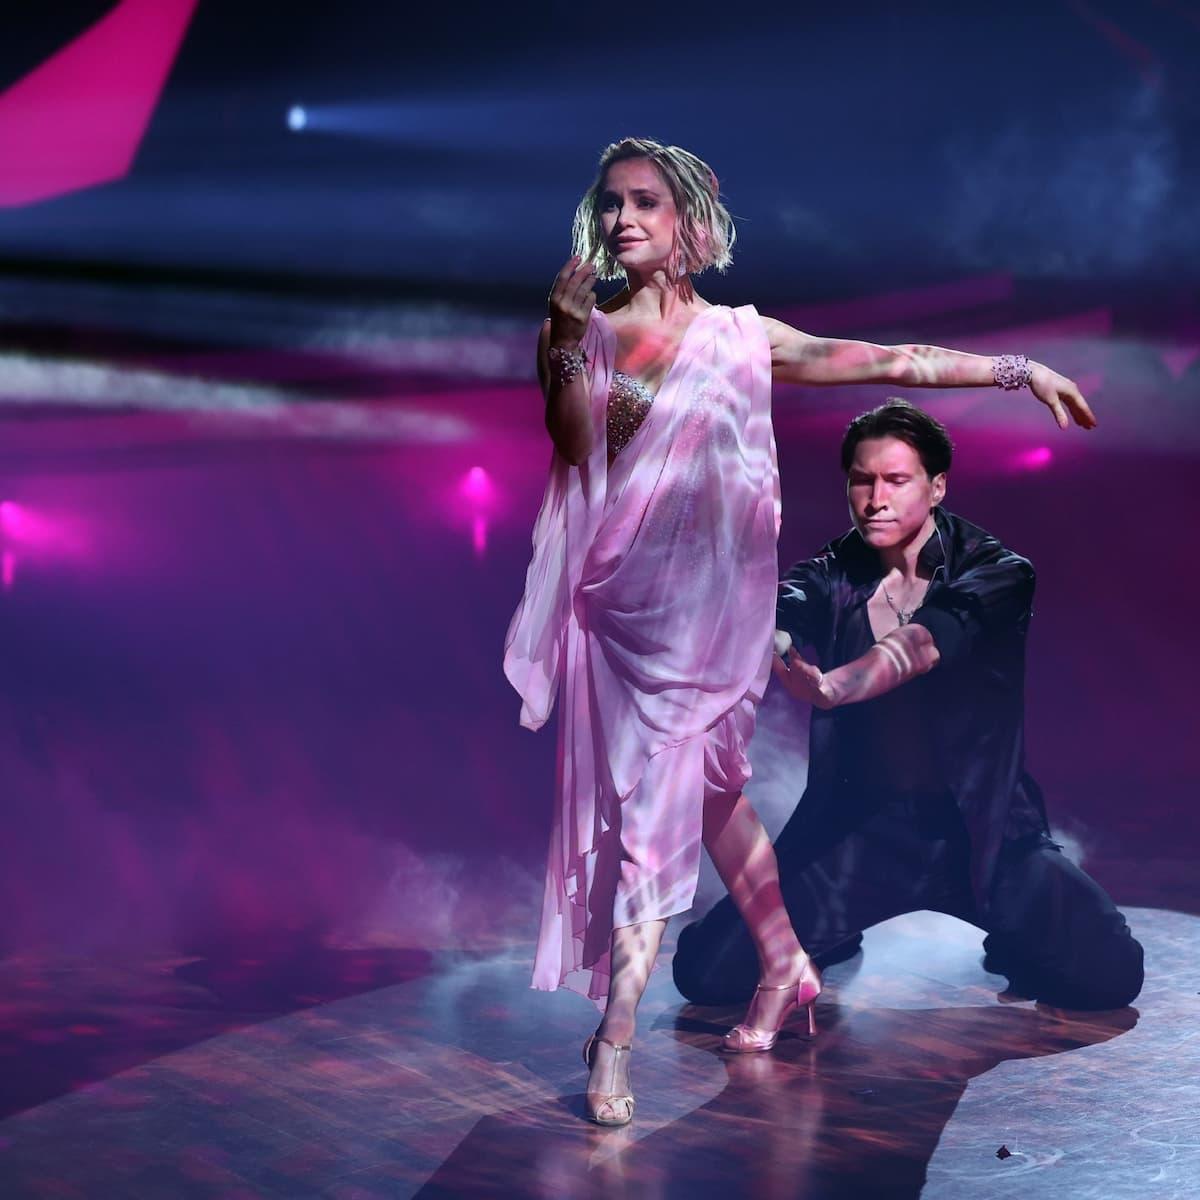 Nina Bezzubova - Evgeny Vinokurov Profi-Challenge Let's dance am 4.6.2021